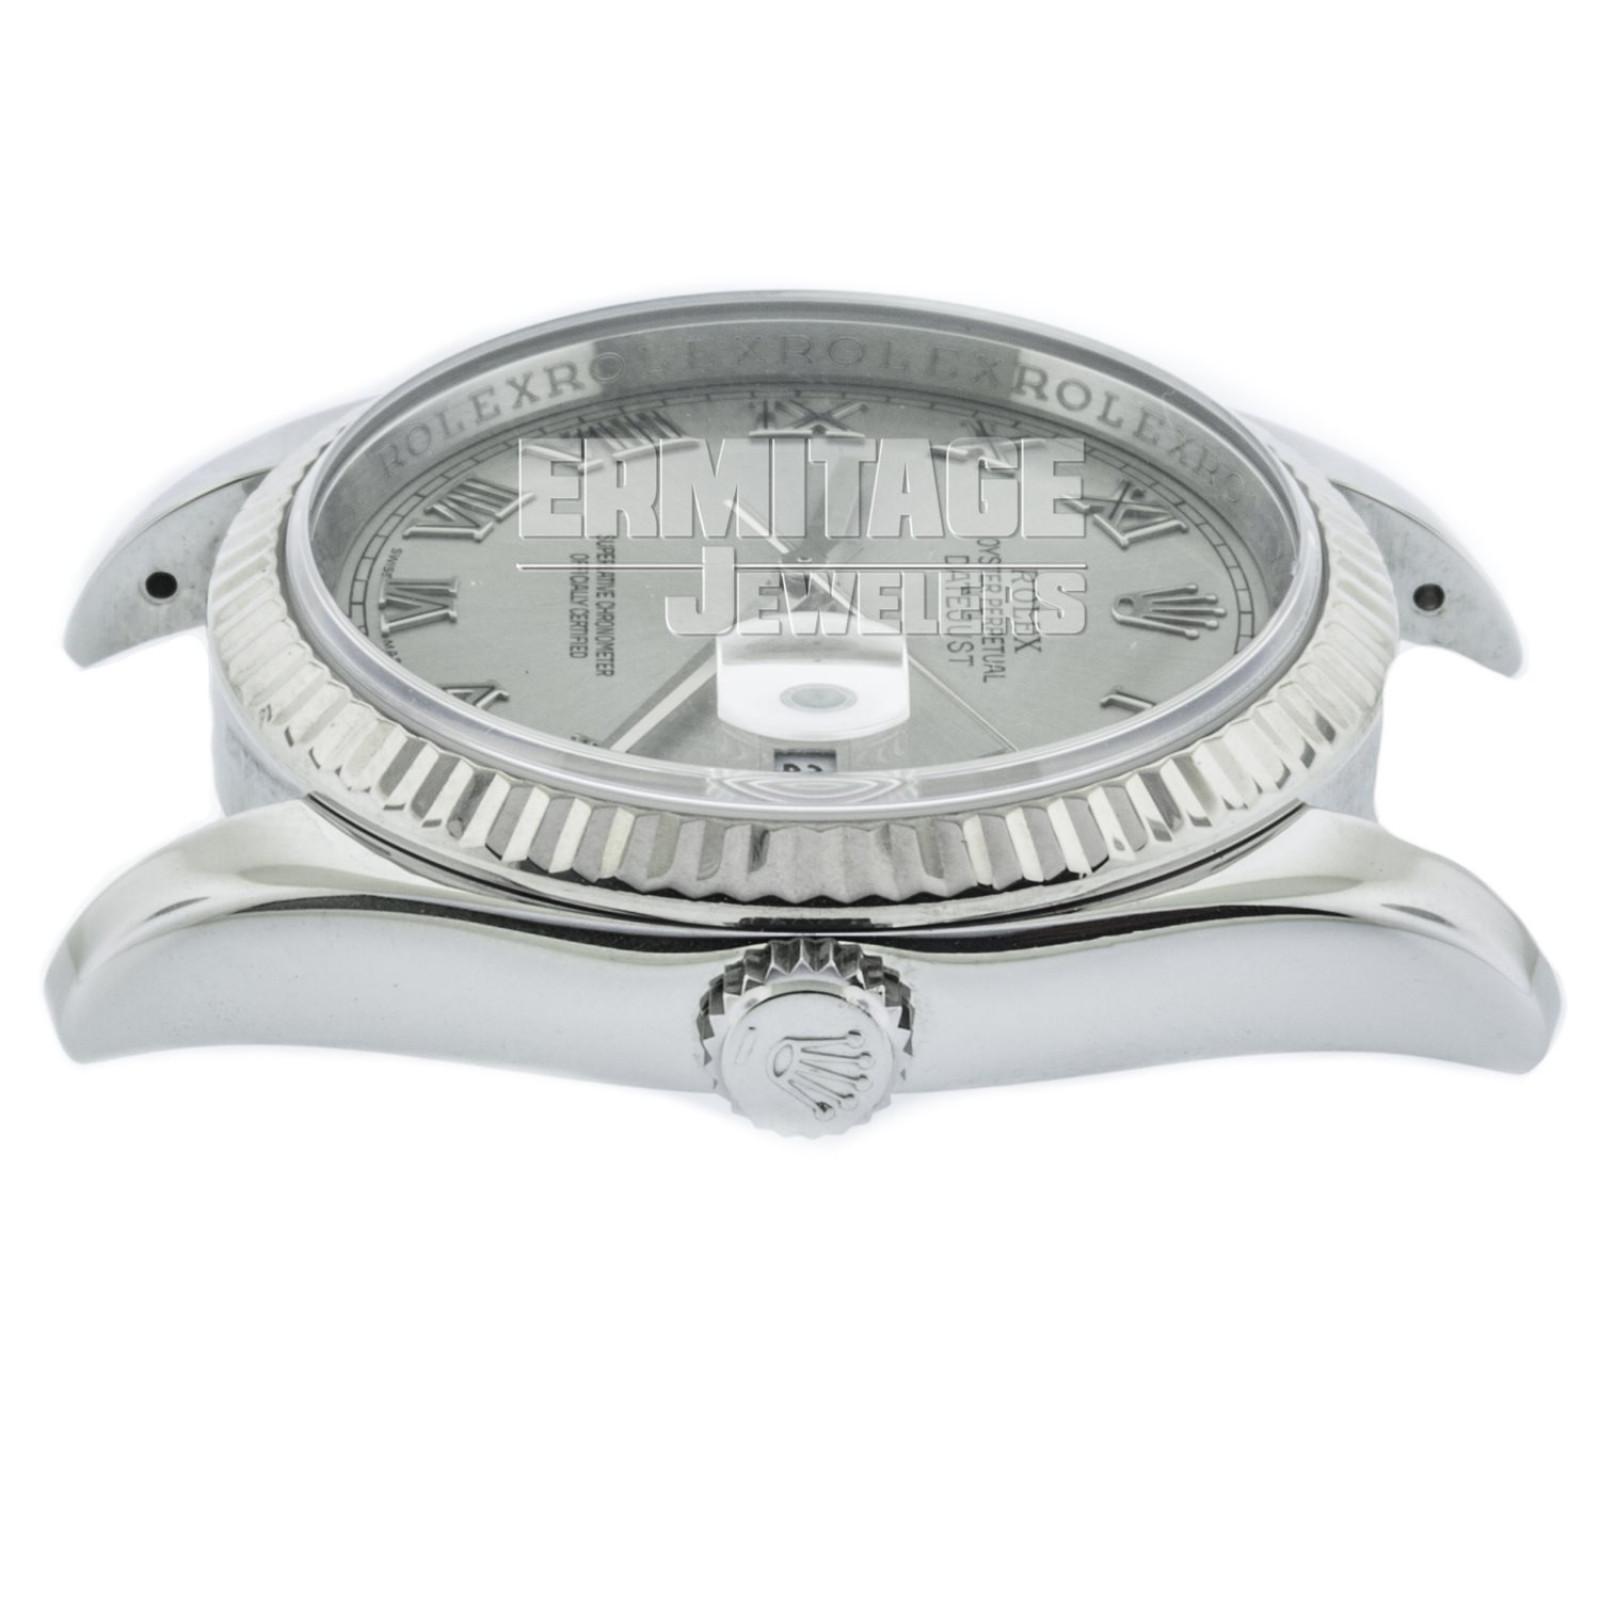 Rolex Datejust 116234 36 mm White Gold & Steel on Jubilee